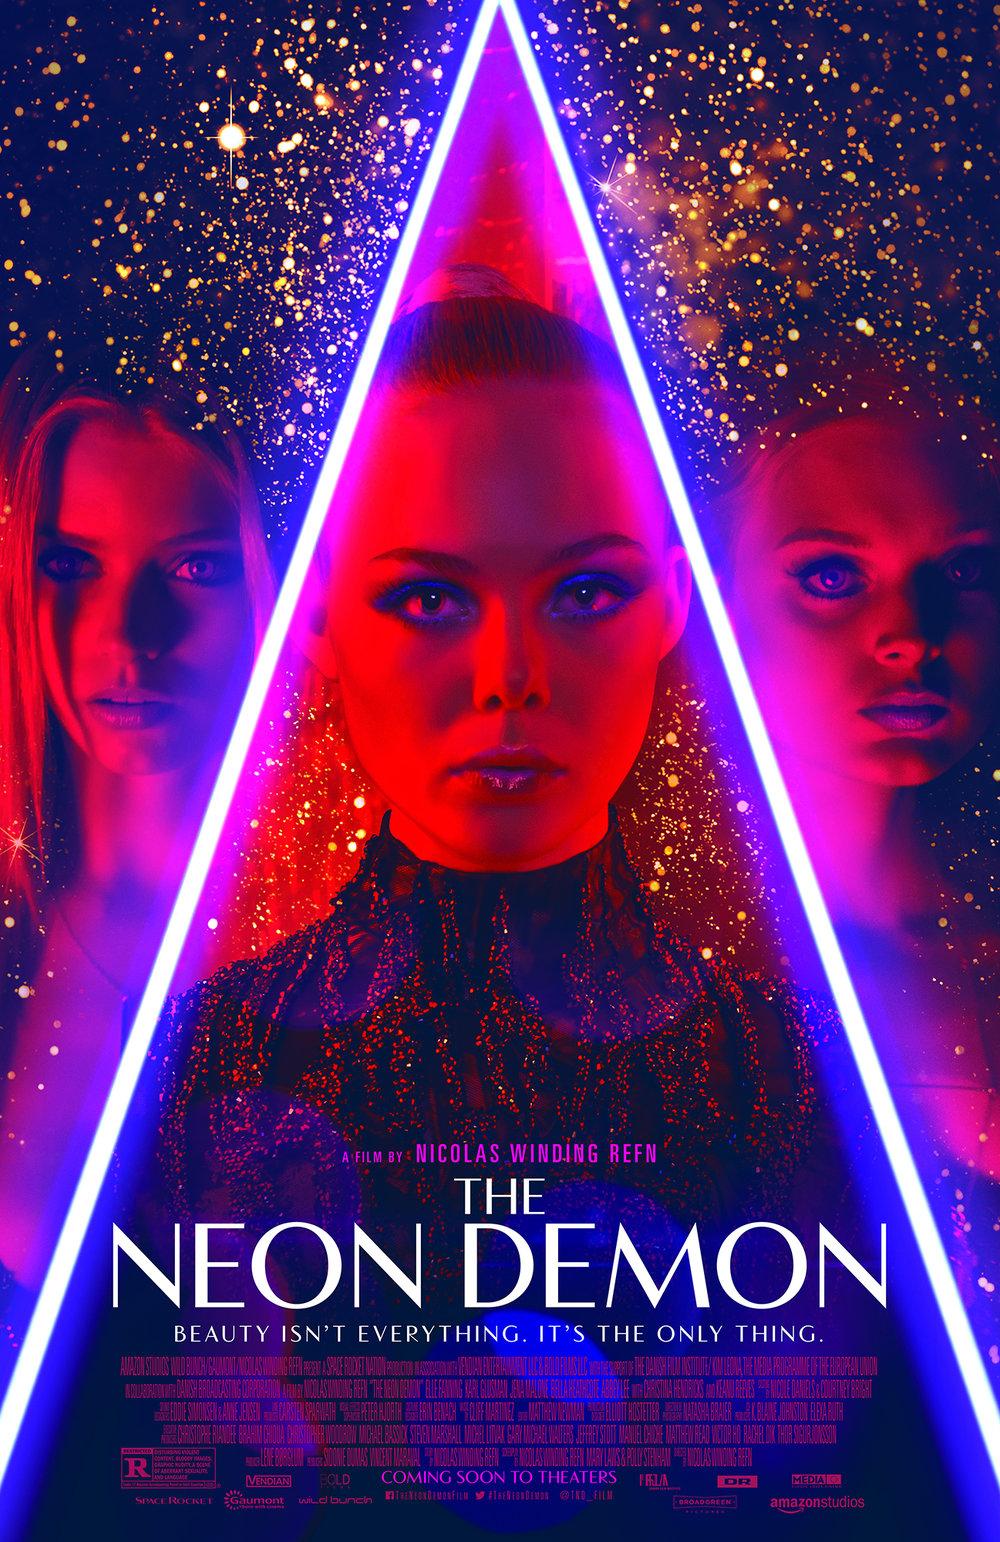 NeonDemon_1Sht_Payoff_VF.jpg